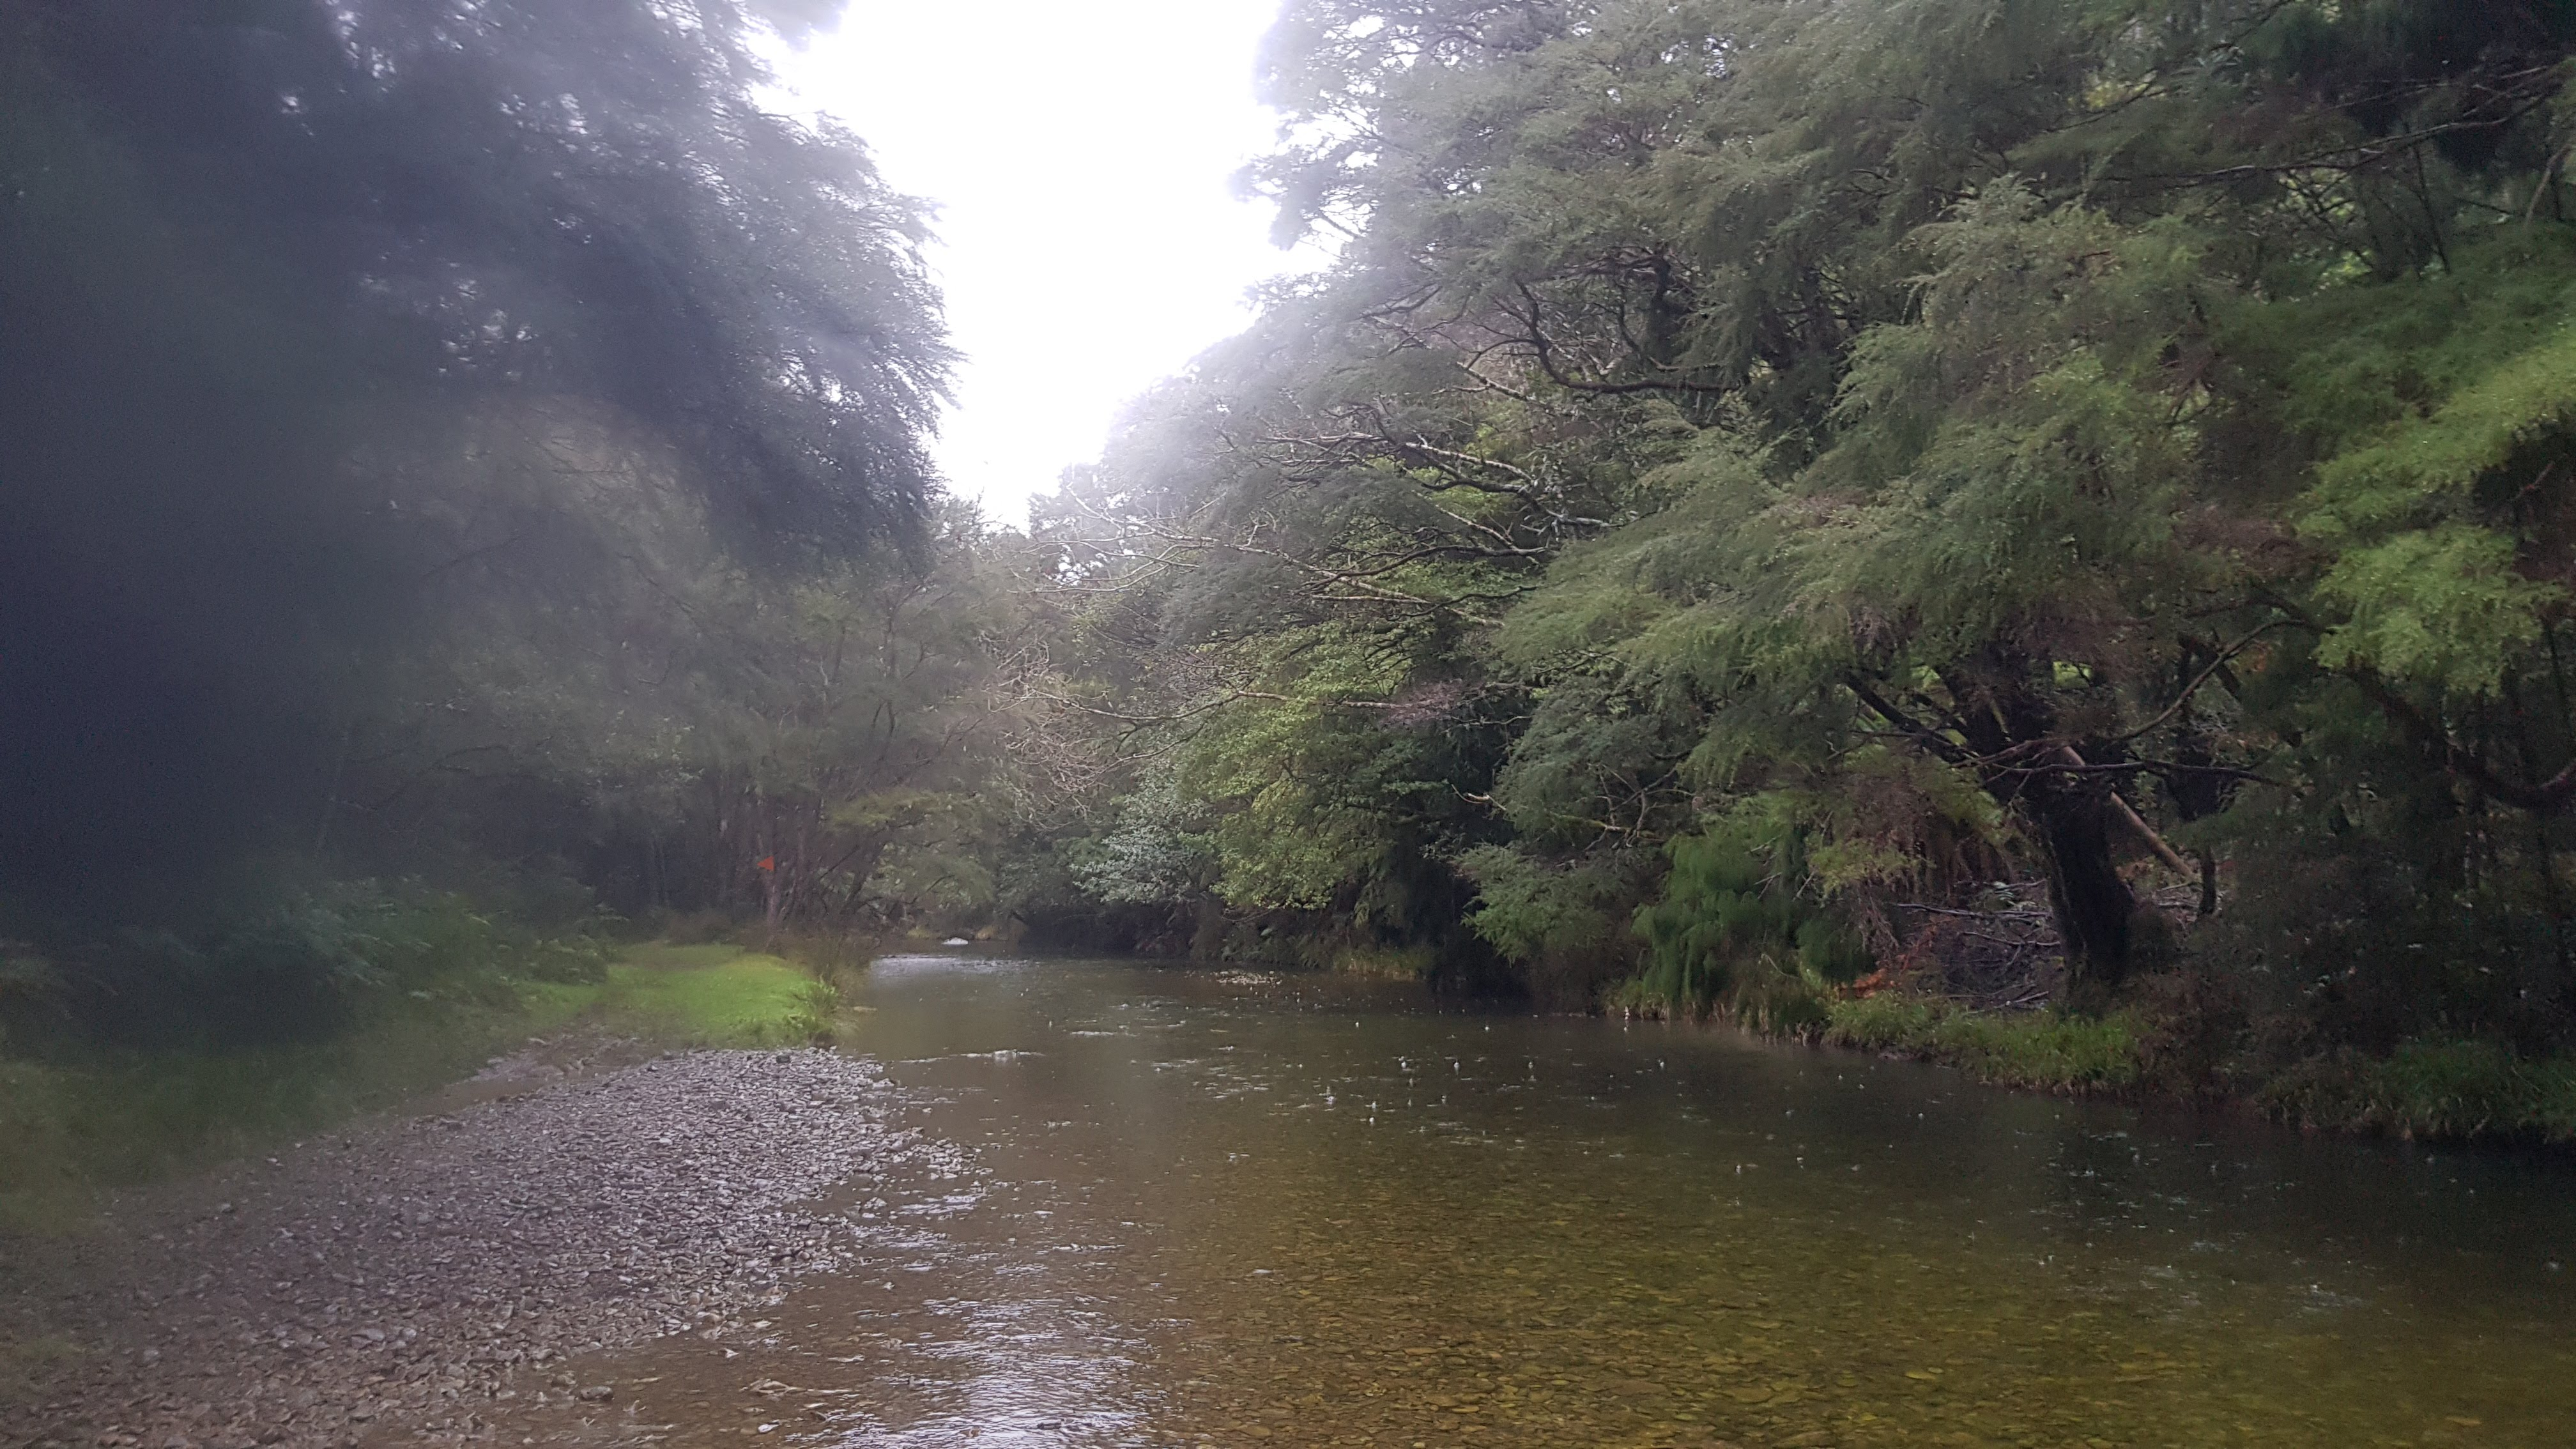 Crossing the stream close to Nydia Lodge